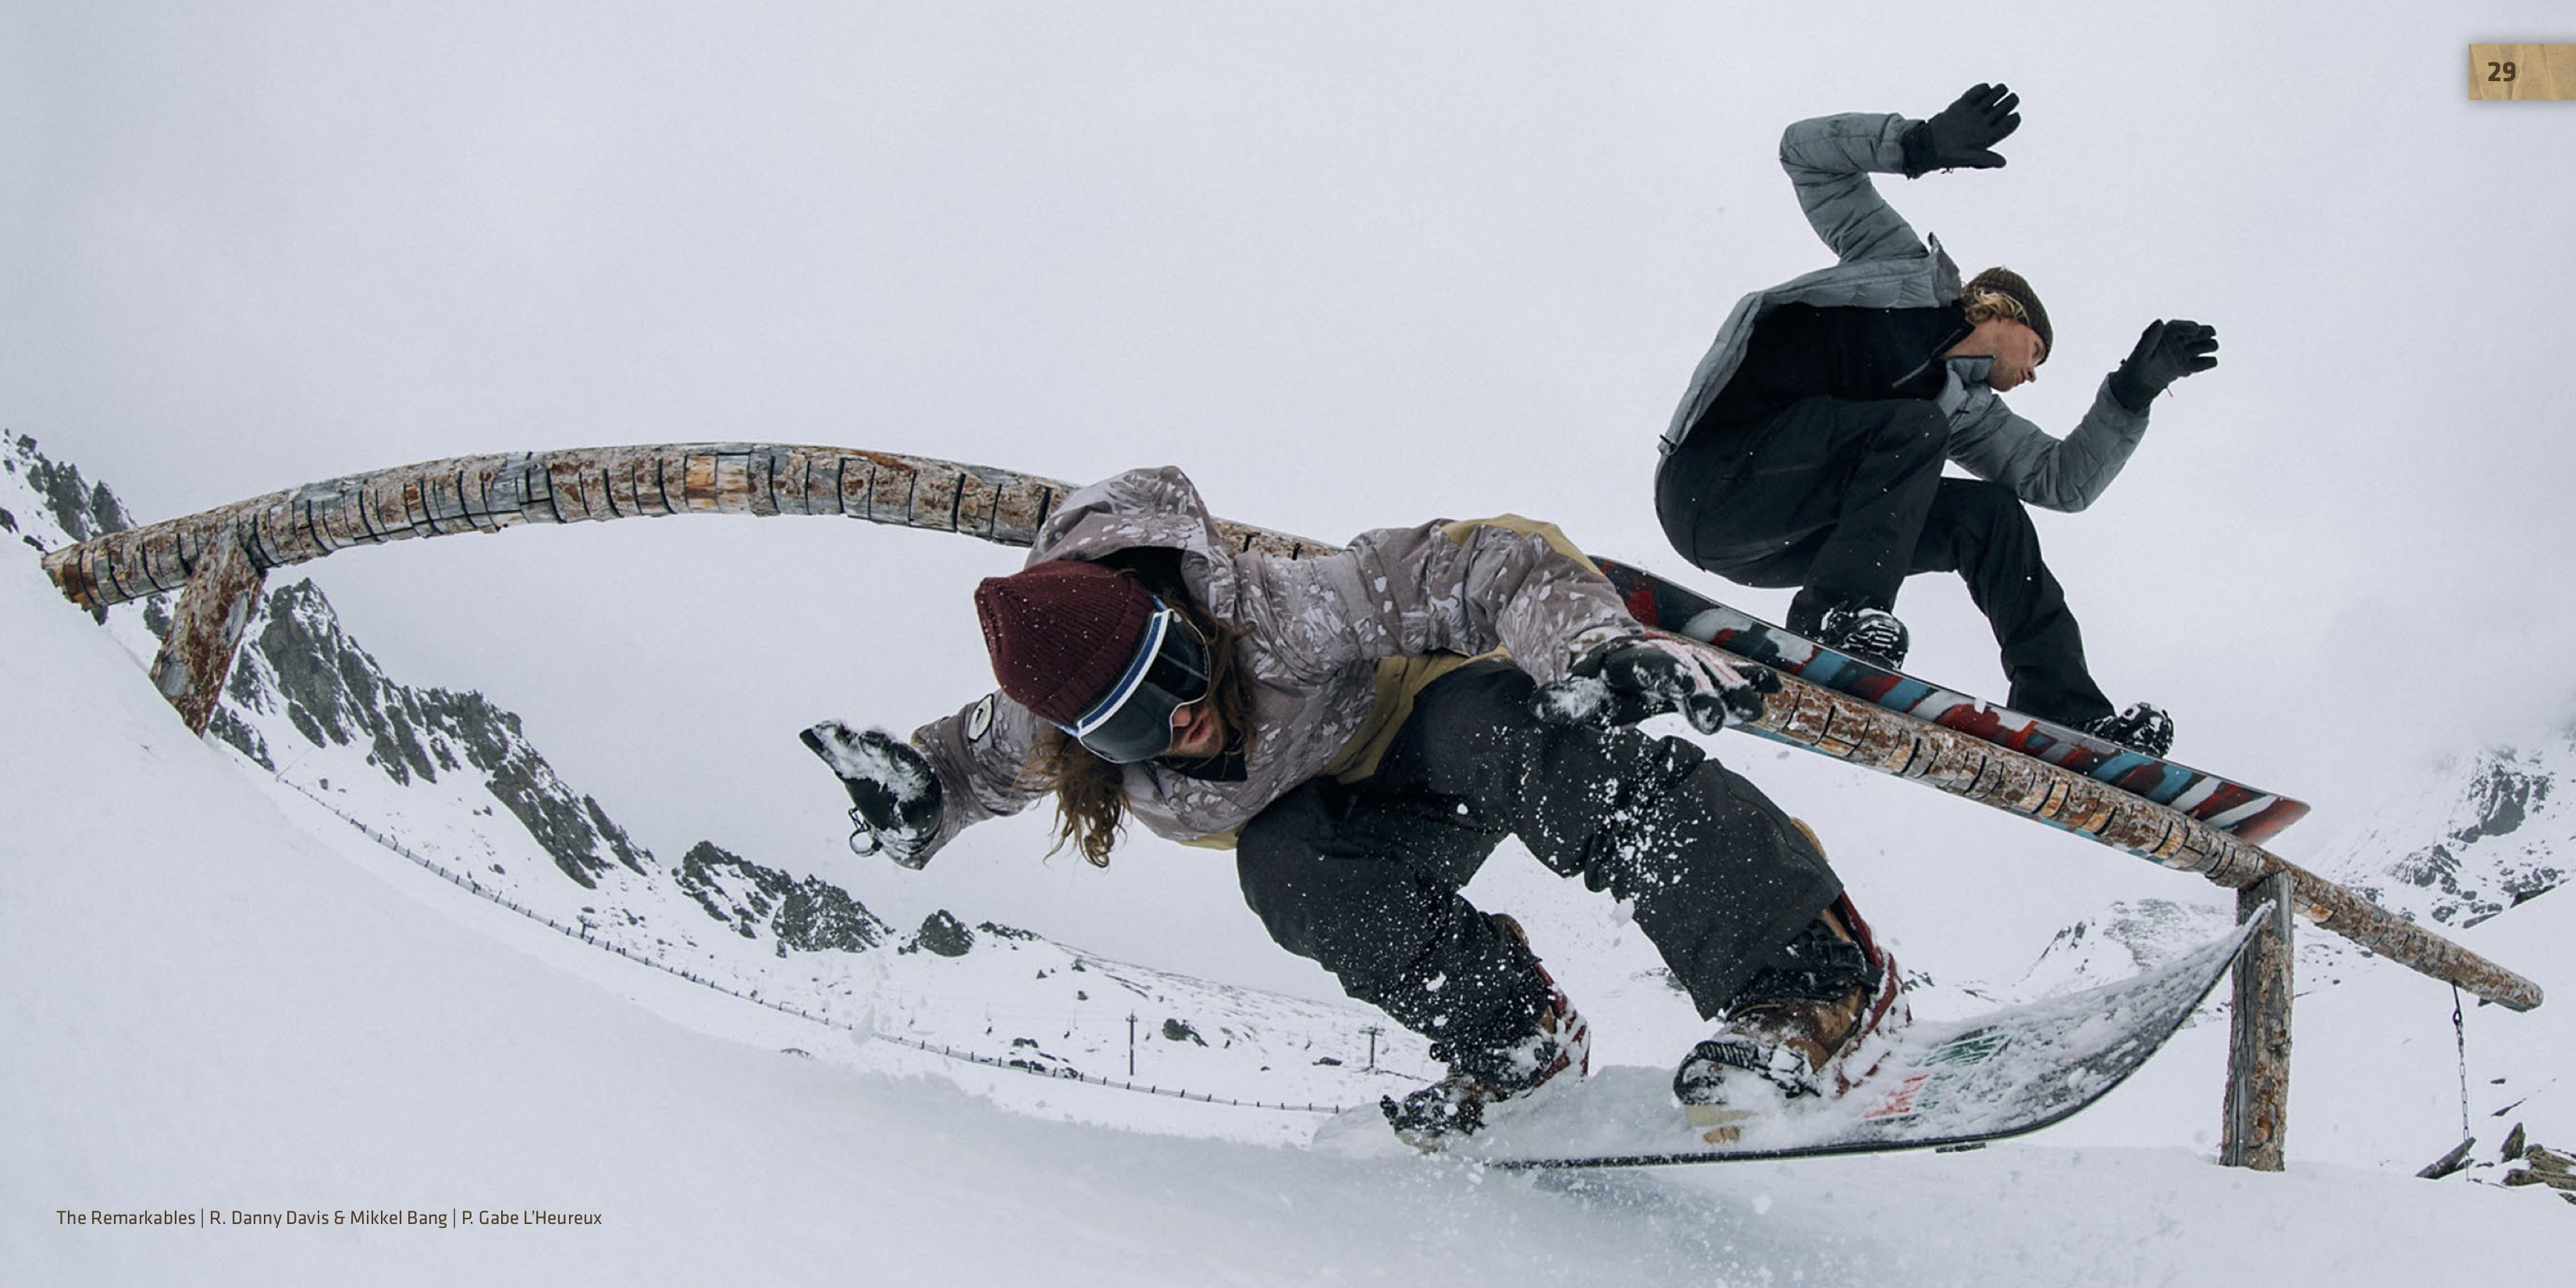 R. Danny Davis and Mikkel Bang snowboarding